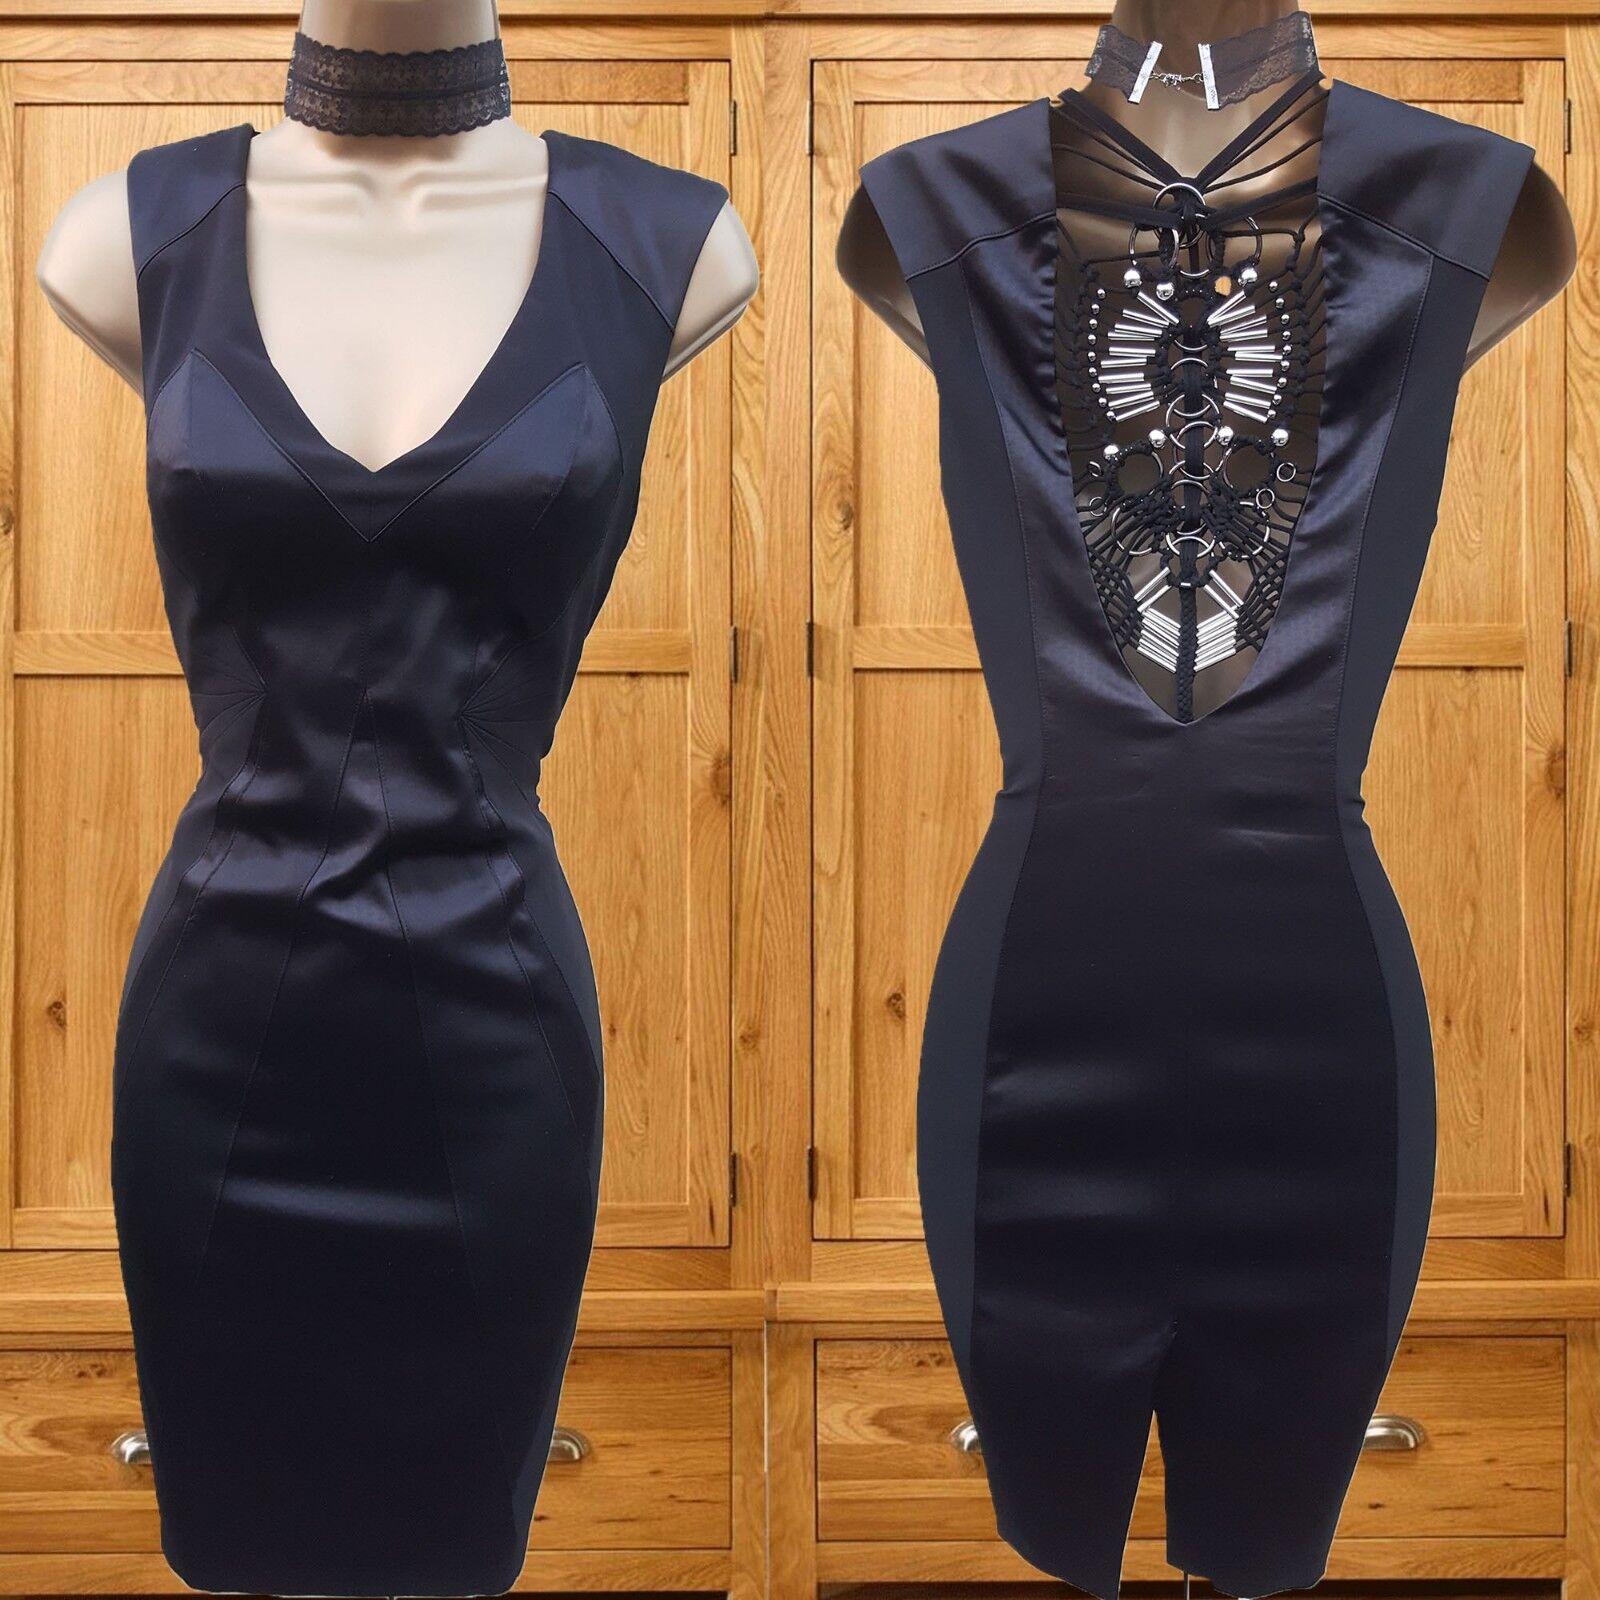 Größe 8 UK KAREN MILLEN schwarz Satin Macrame Art Deco Mini Dress Christmas Party